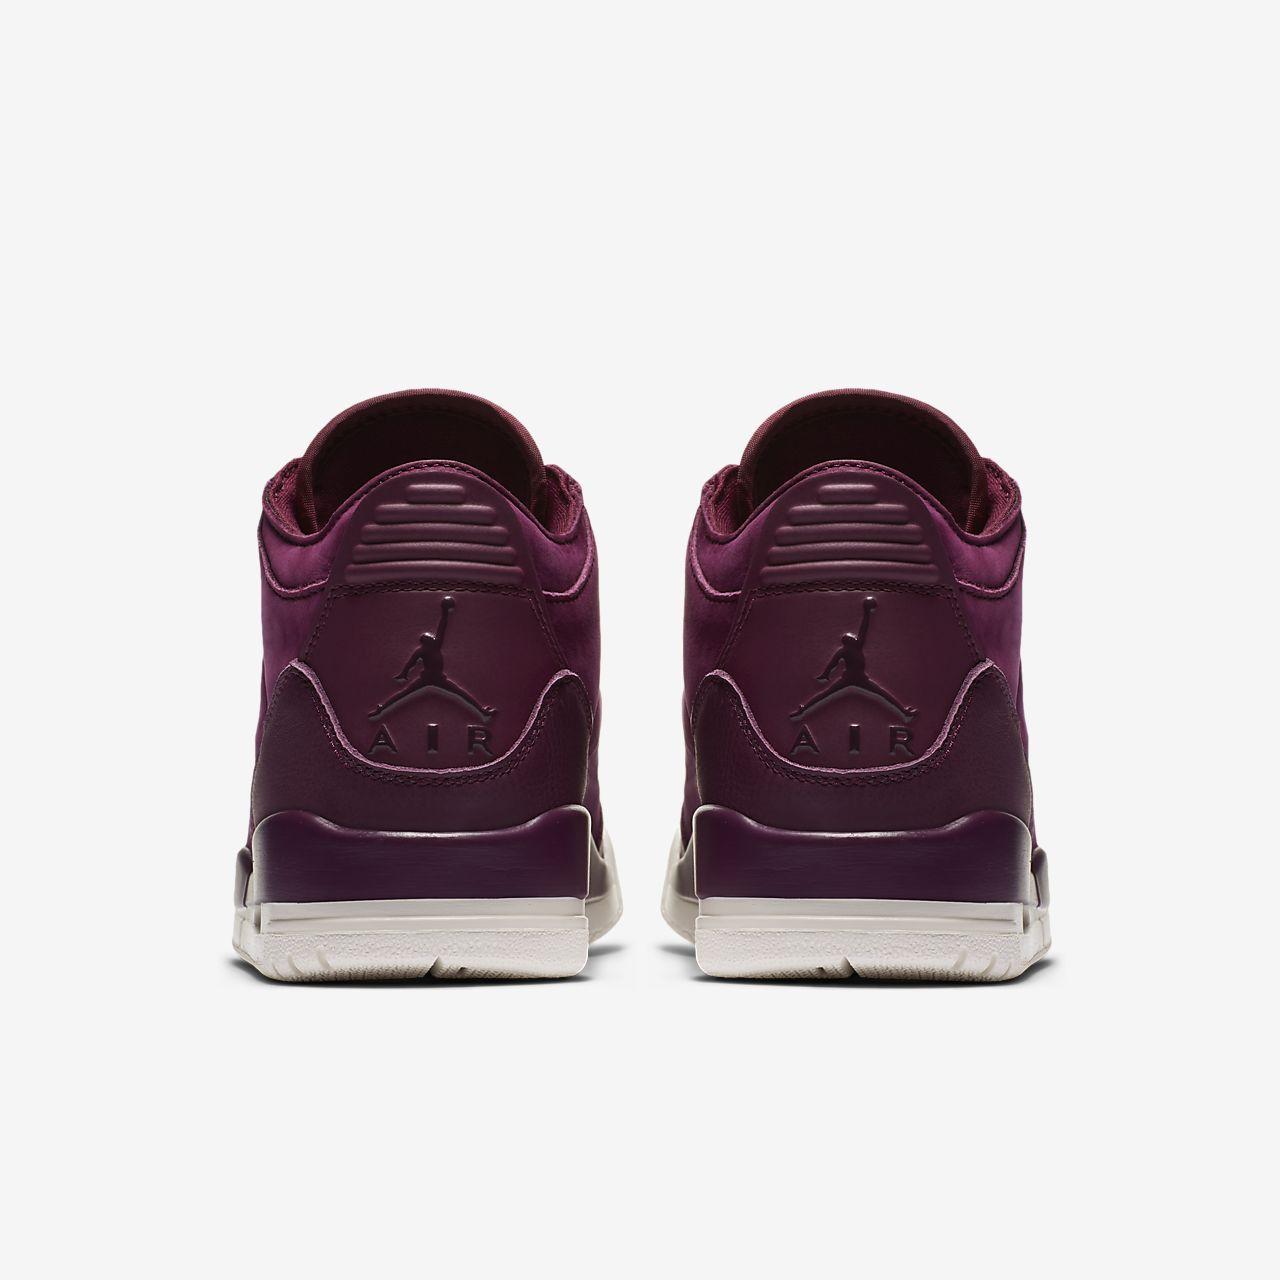 1b4de011466dad Air Jordan 3 Retro SE Women s Shoe. Nike.com GB